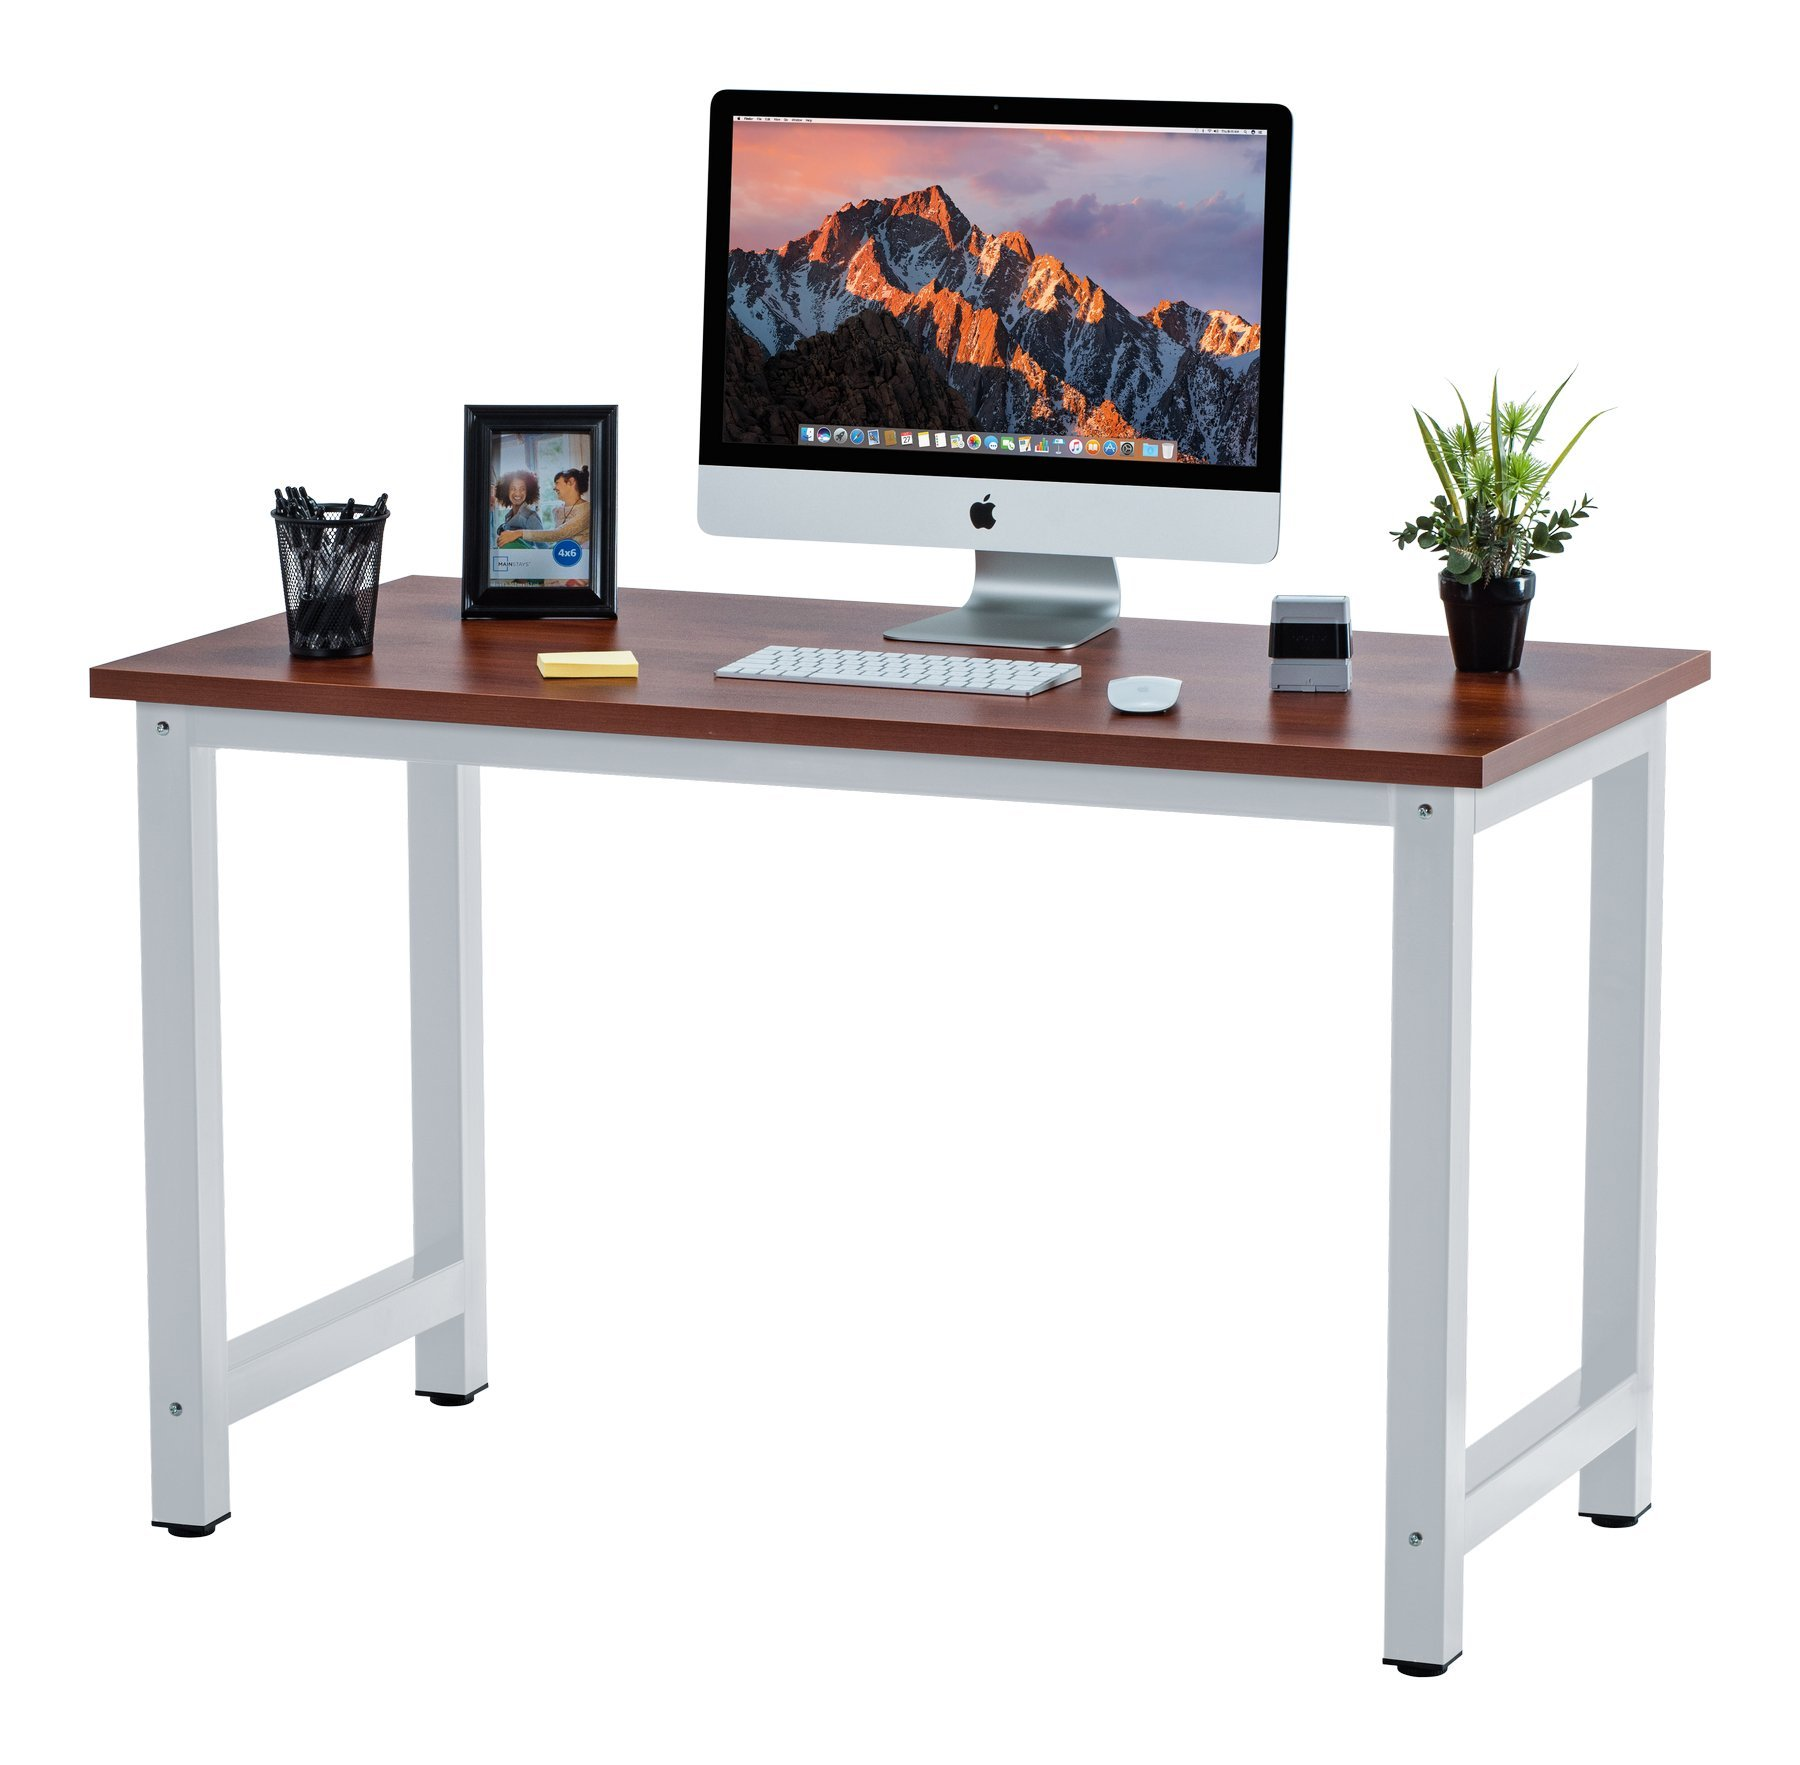 Fineboard 47'' Stylish Home Office Computer Desk Writing Table Elegant & Modern Design, Teak/White